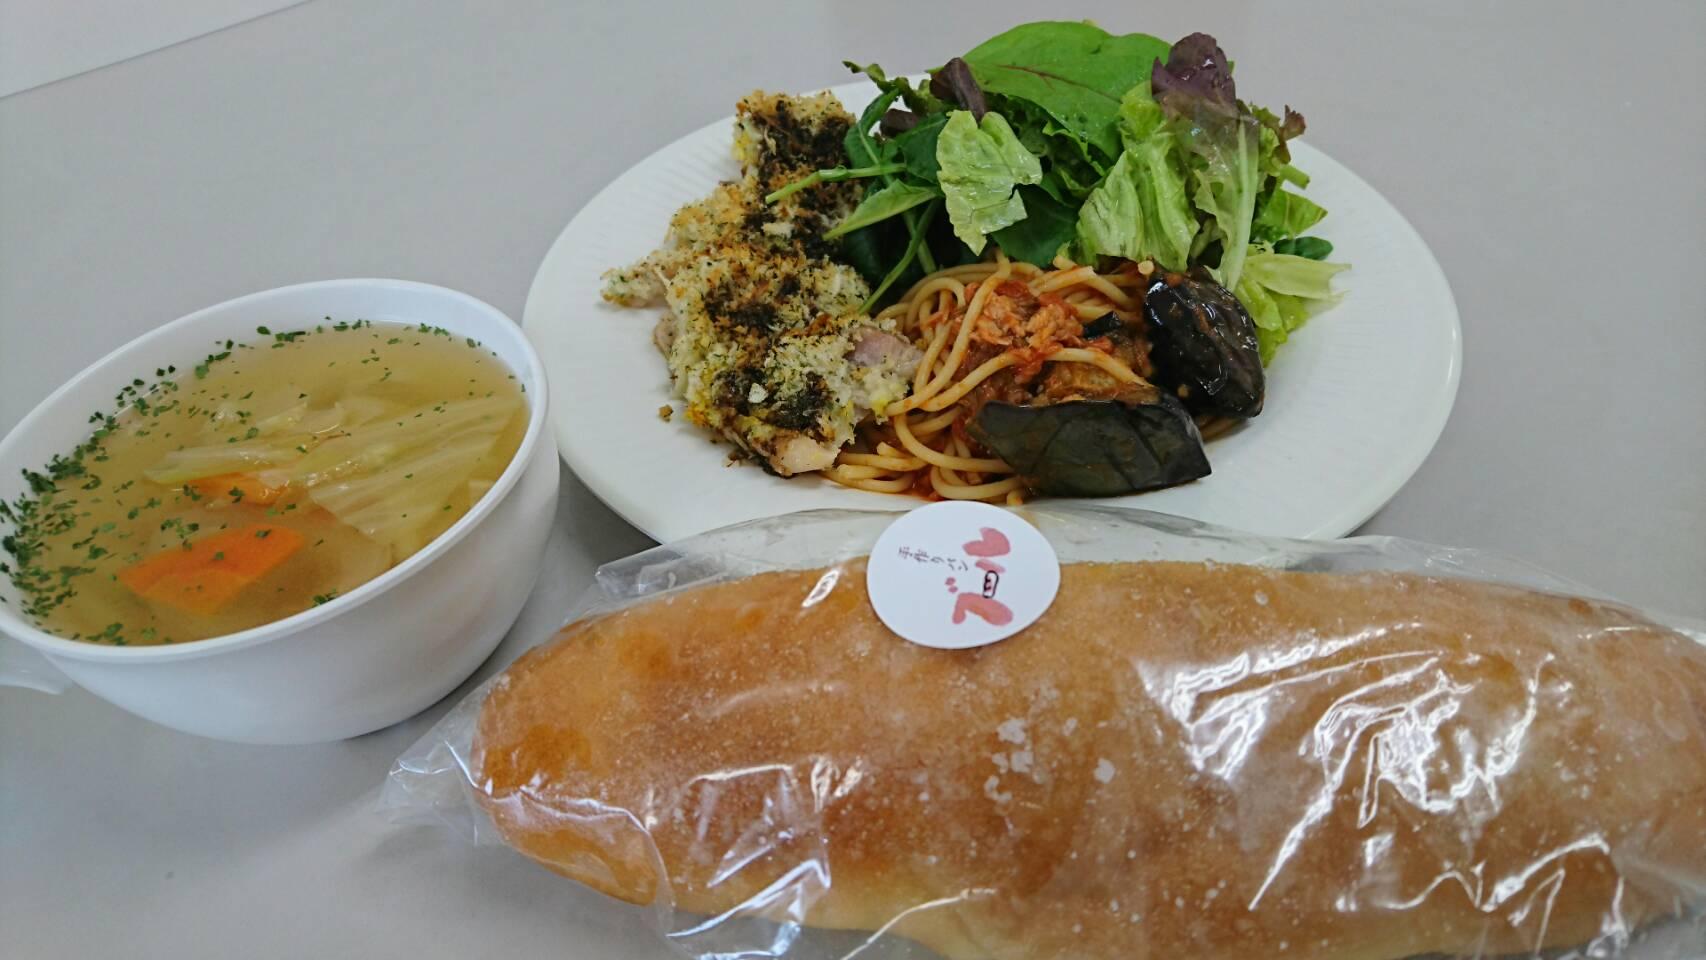 http://chichibu-med.jp/ndblog/IMG_7040.JPG